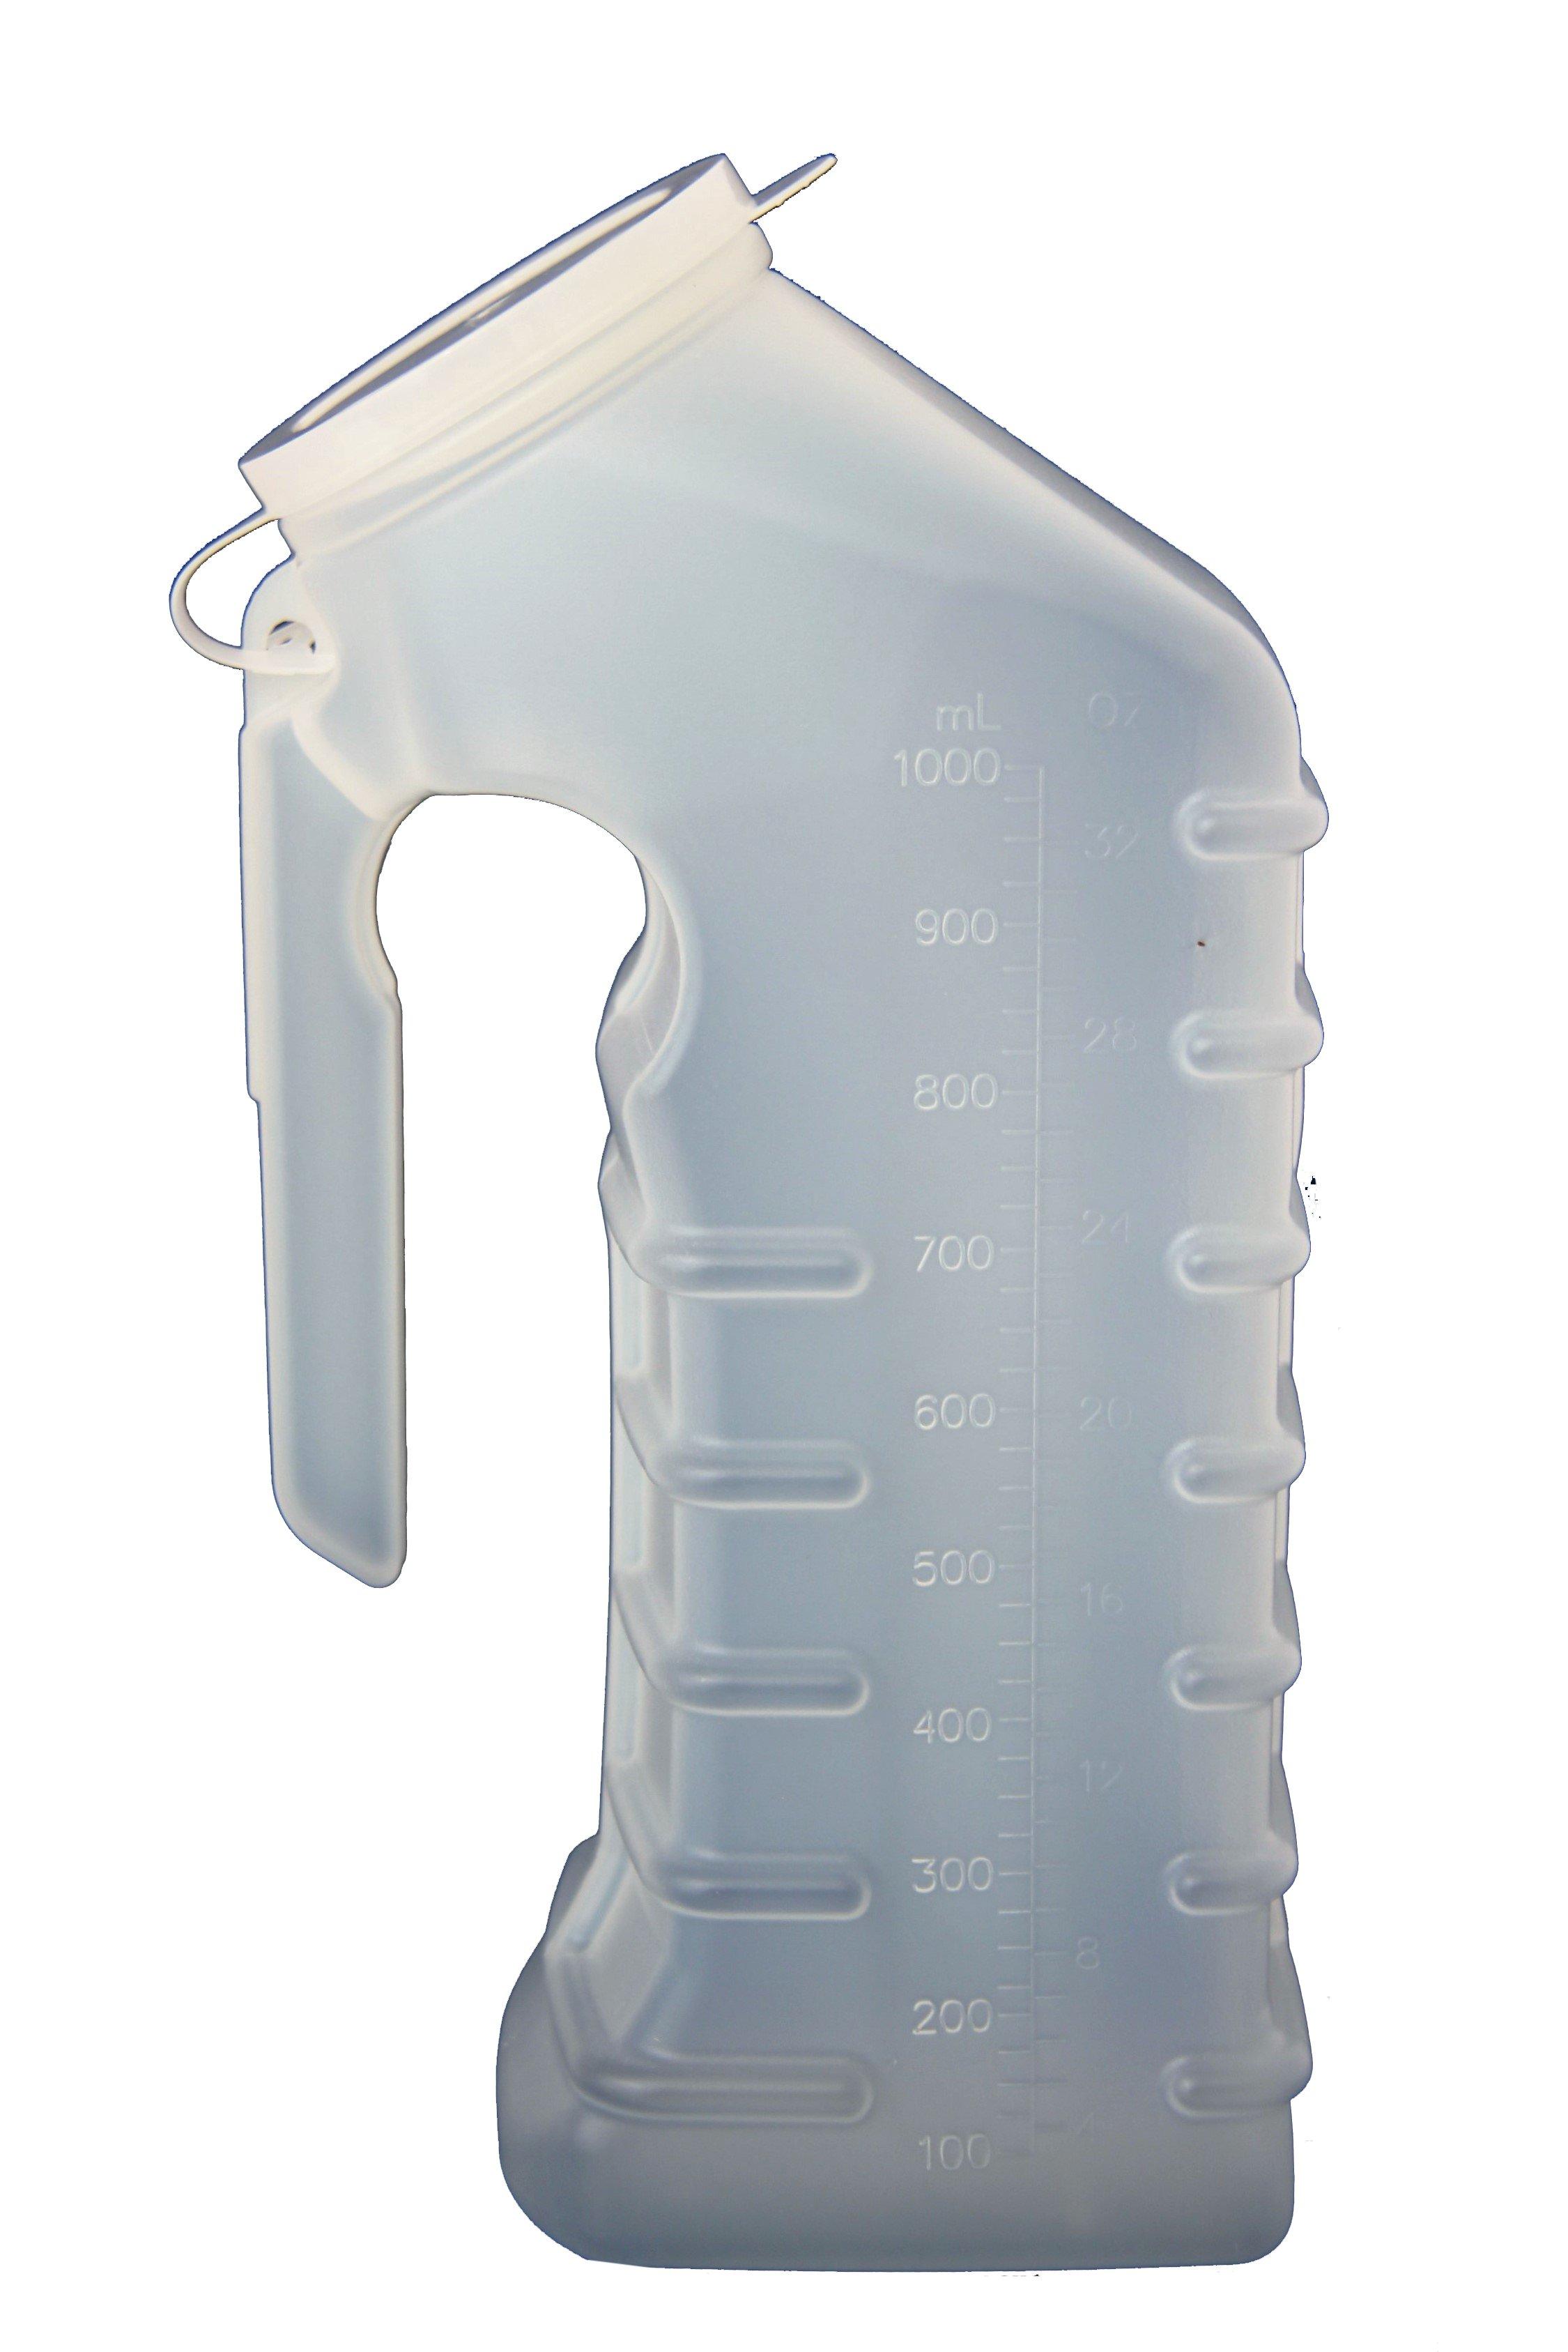 Uri-MAX Male Urinal with Closure, 32 oz., GP300, 1 Each